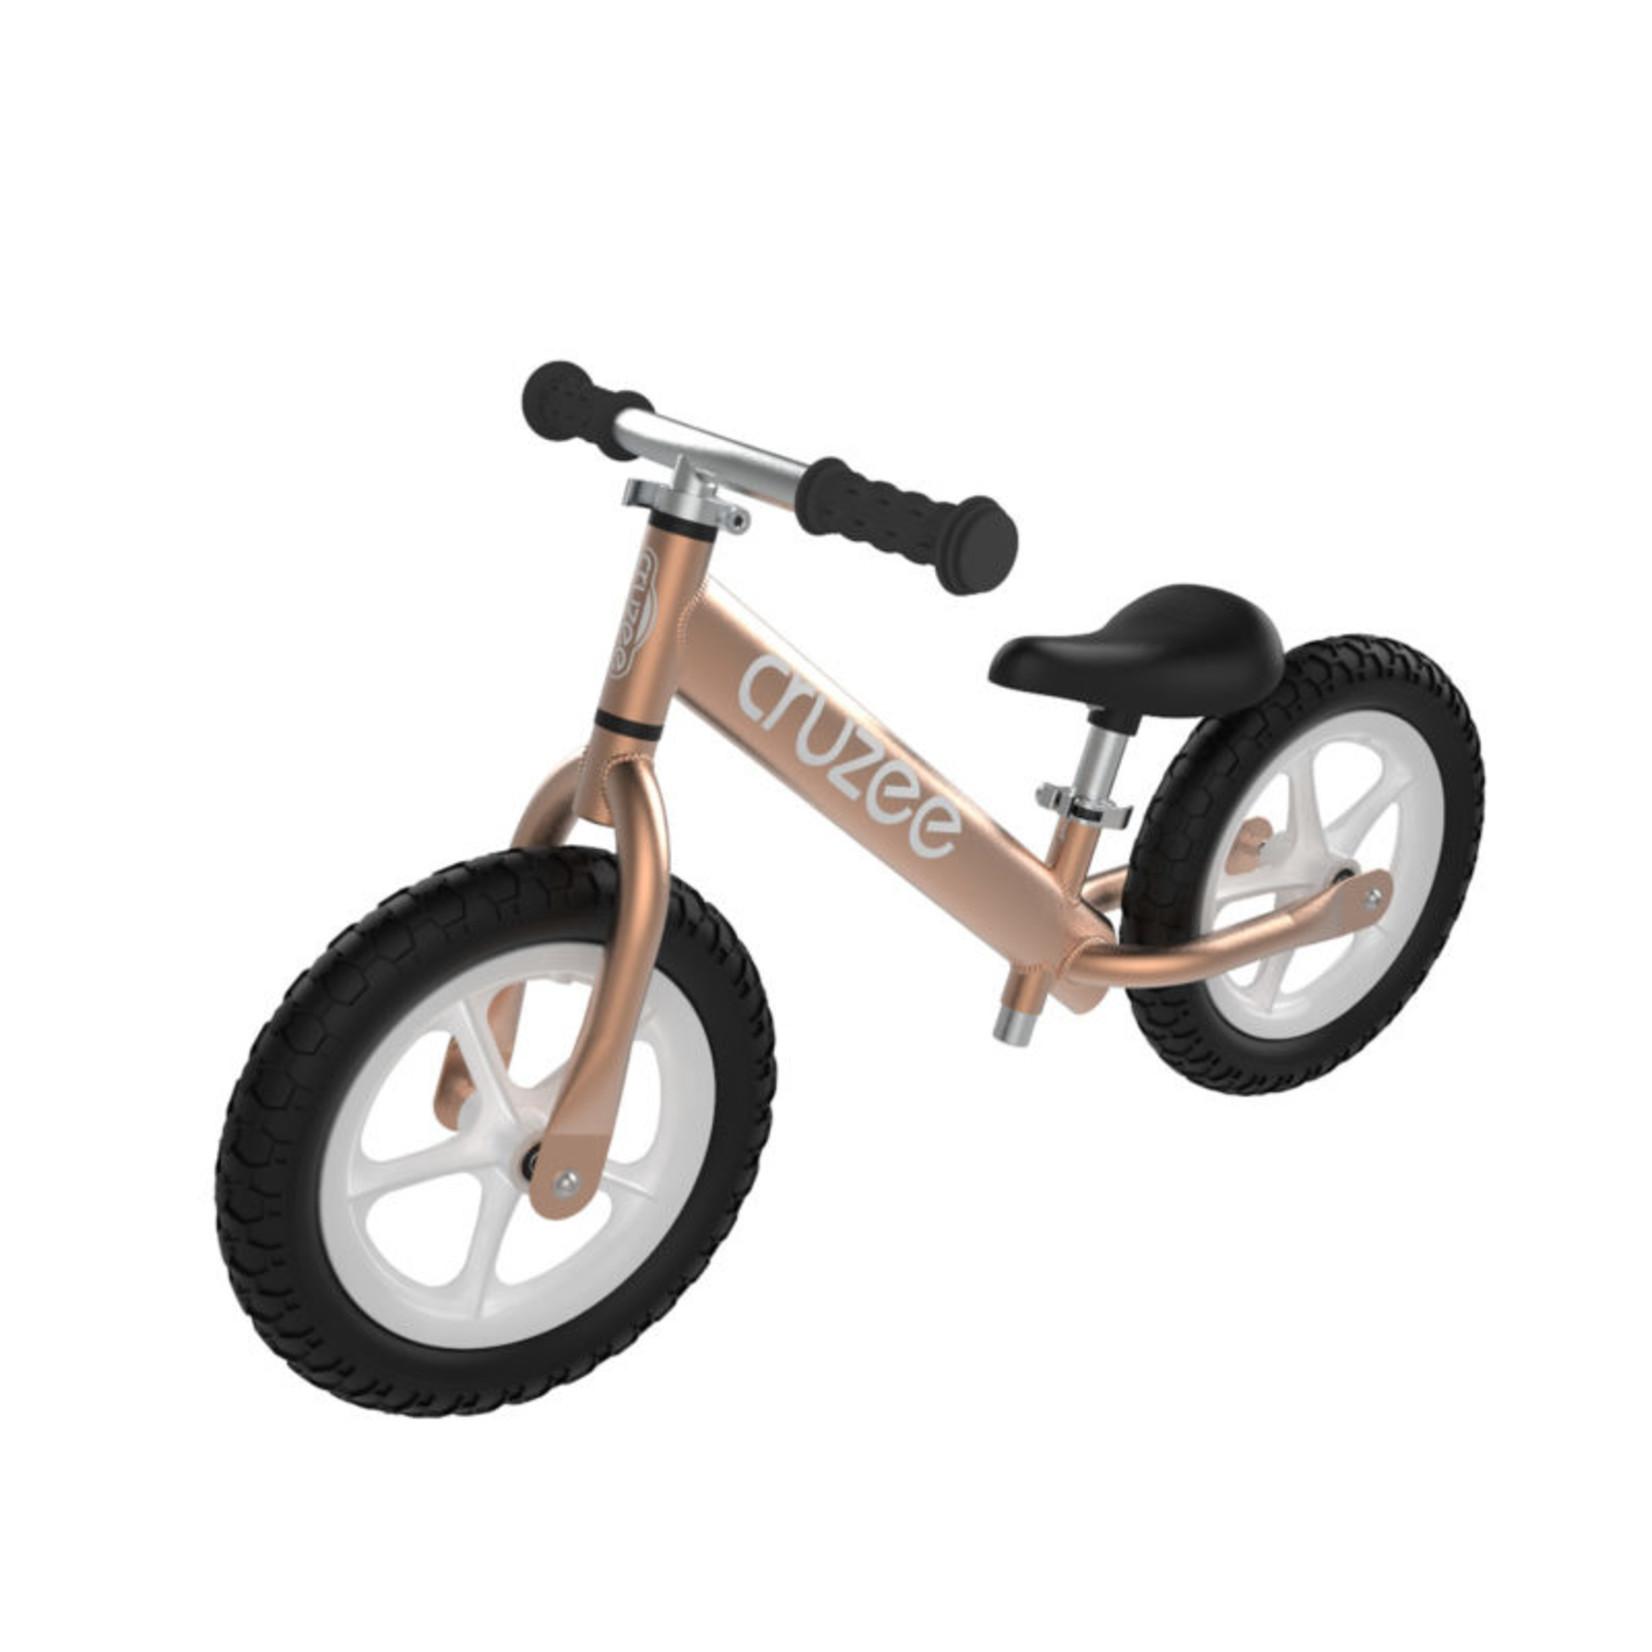 Cruzee Cruzee, Balance Bike